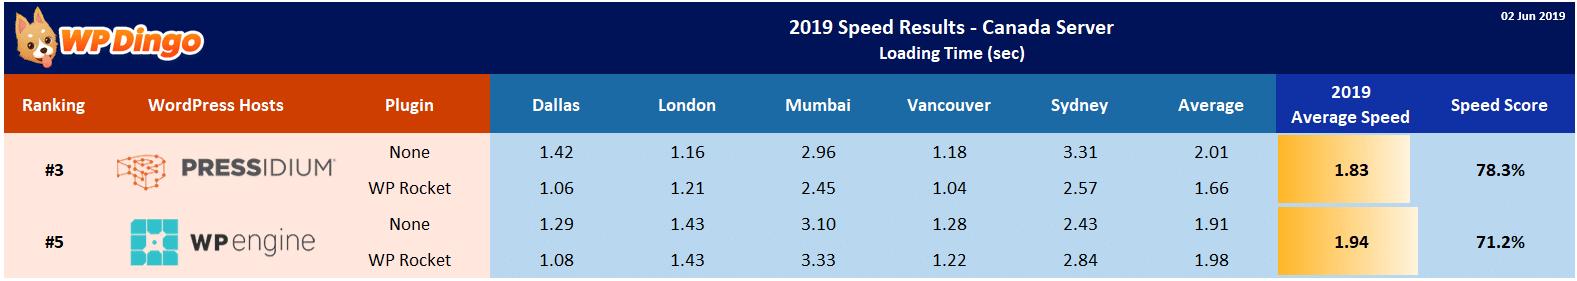 2019 Pressidium vs WP Engine Speed Table - Canada Server